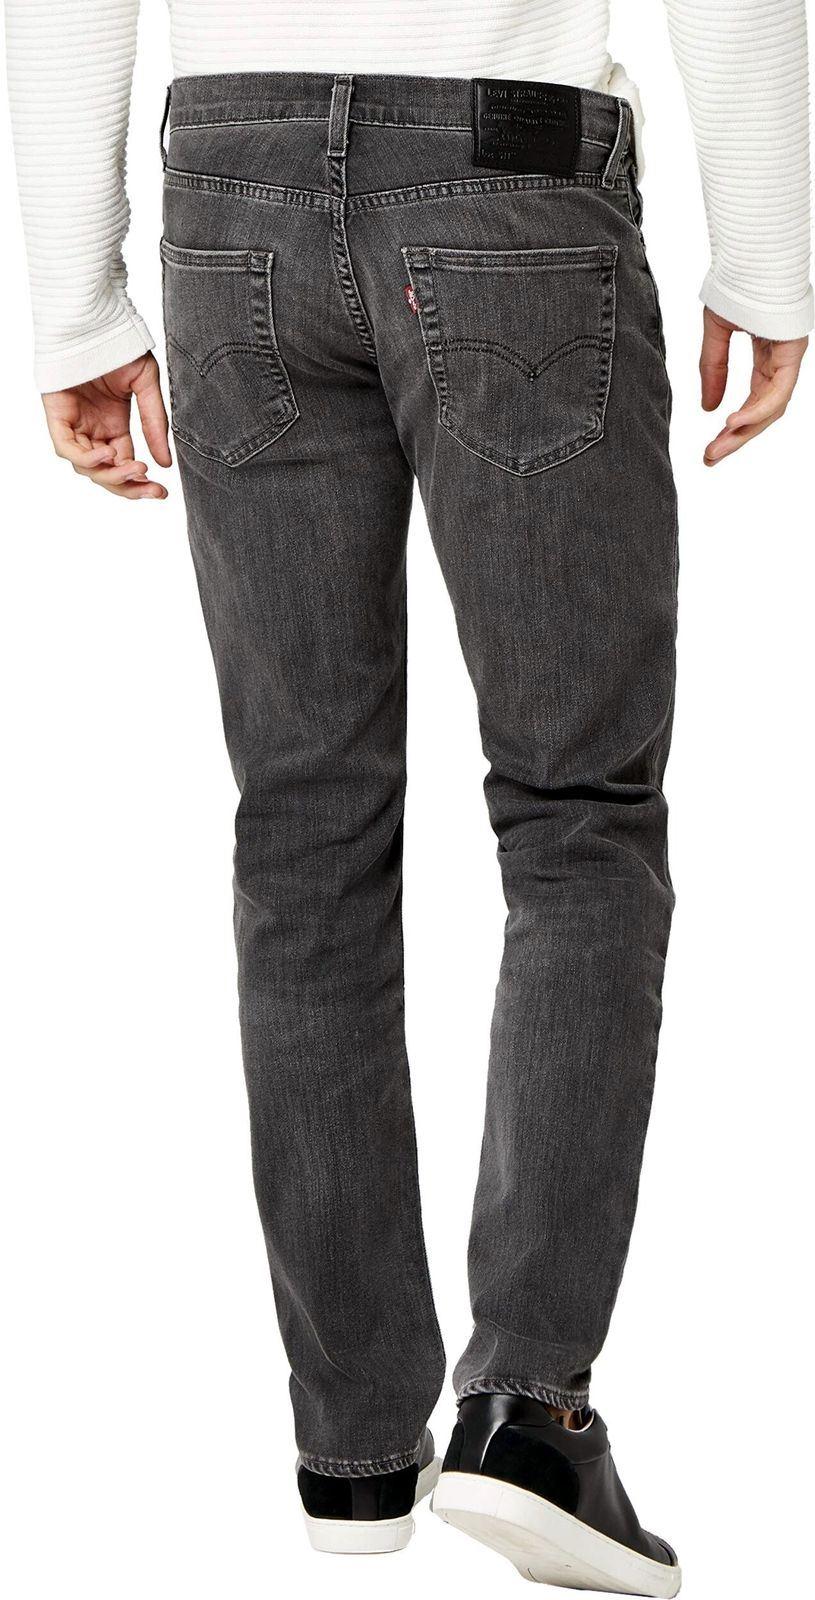 Levi-039-s-511-Slim-Fit-Denim-Jeans-estilos-surtidos miniatura 3